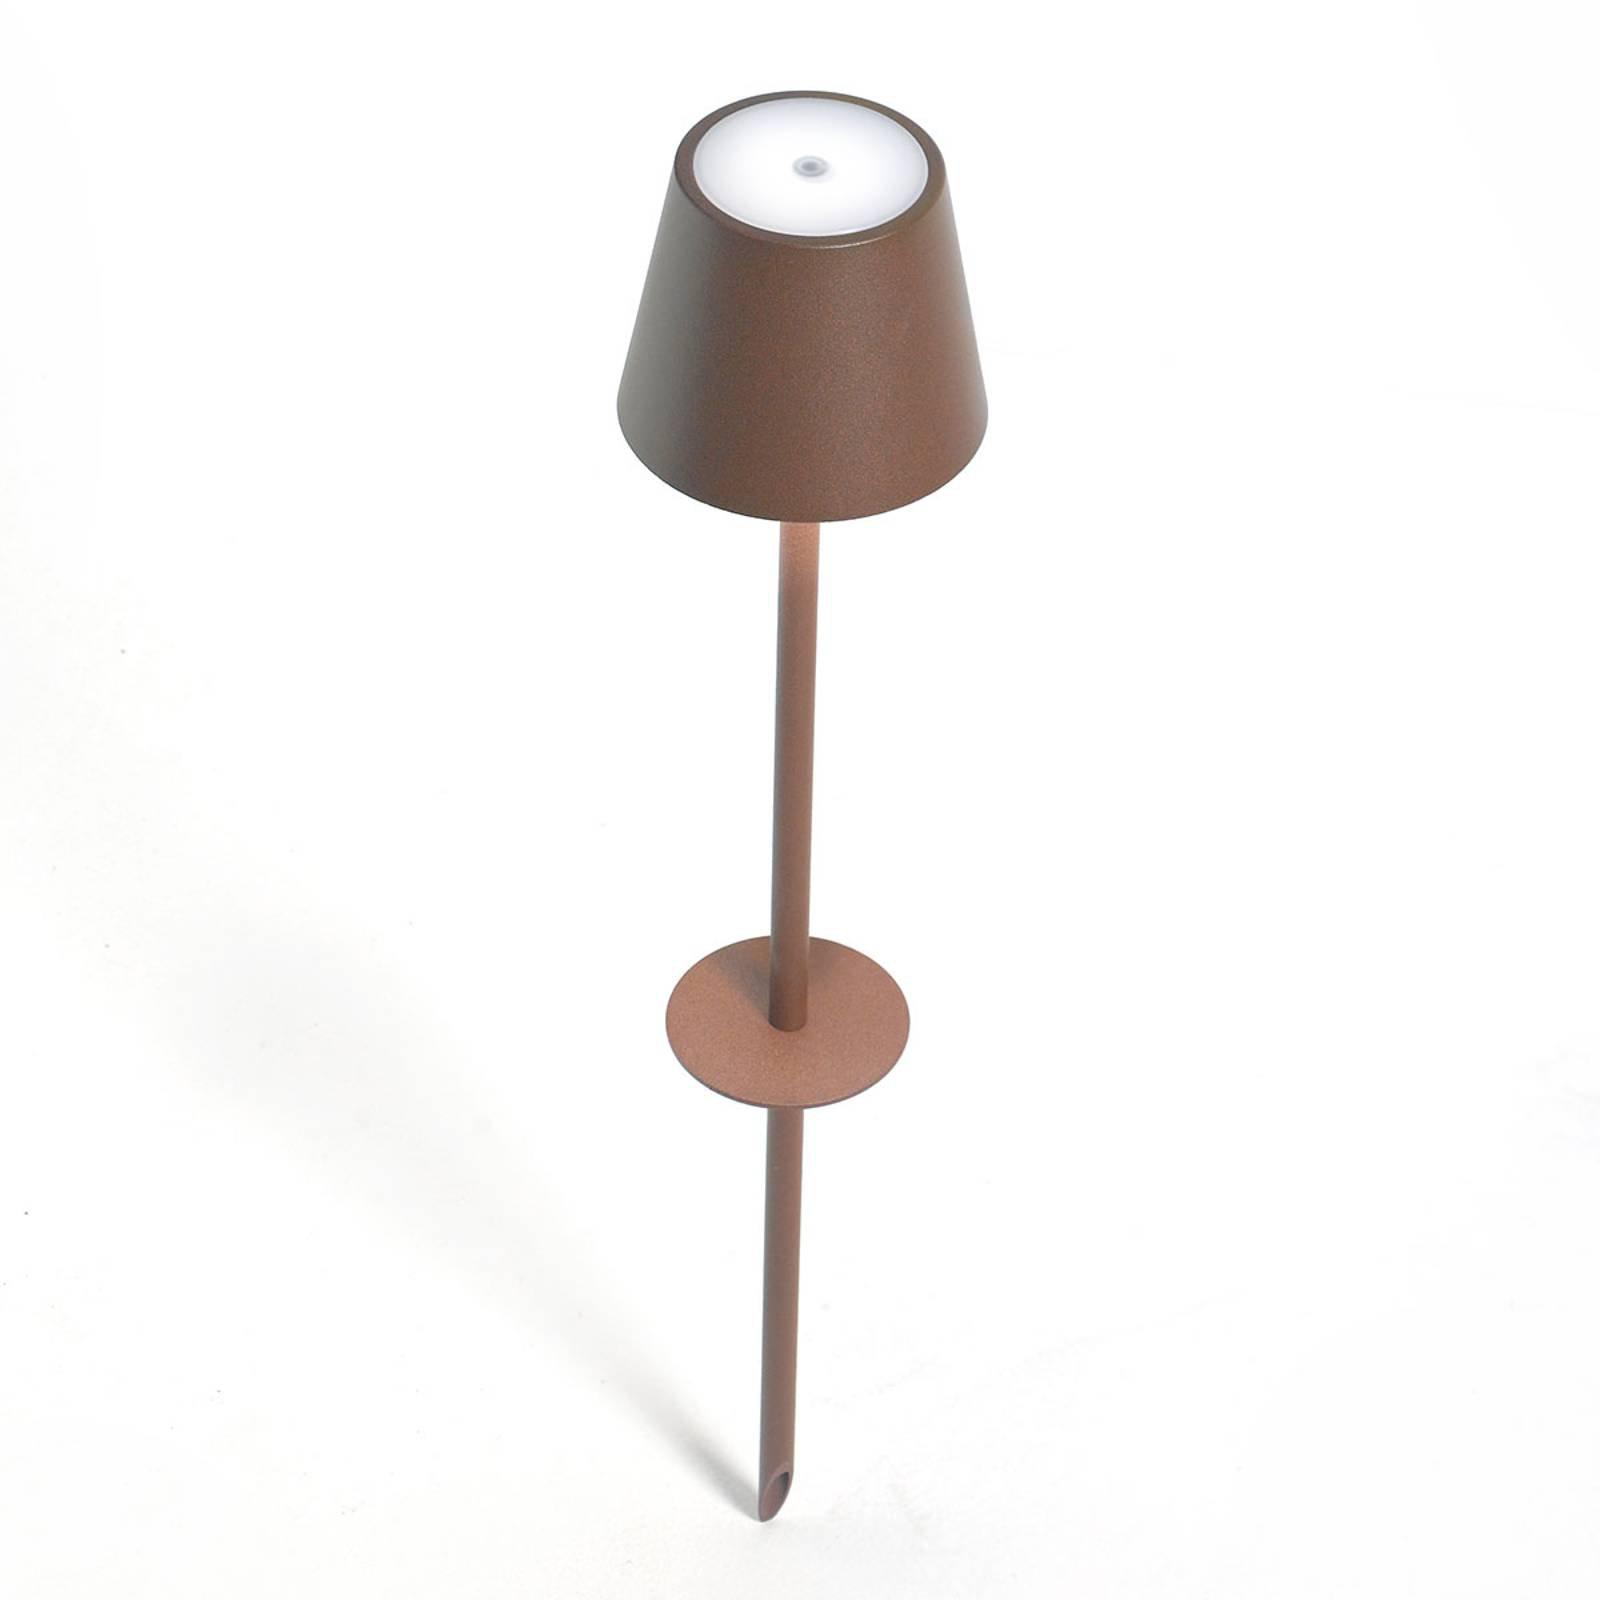 LED-spot med jordspyd Poldina batteri brun 110cm